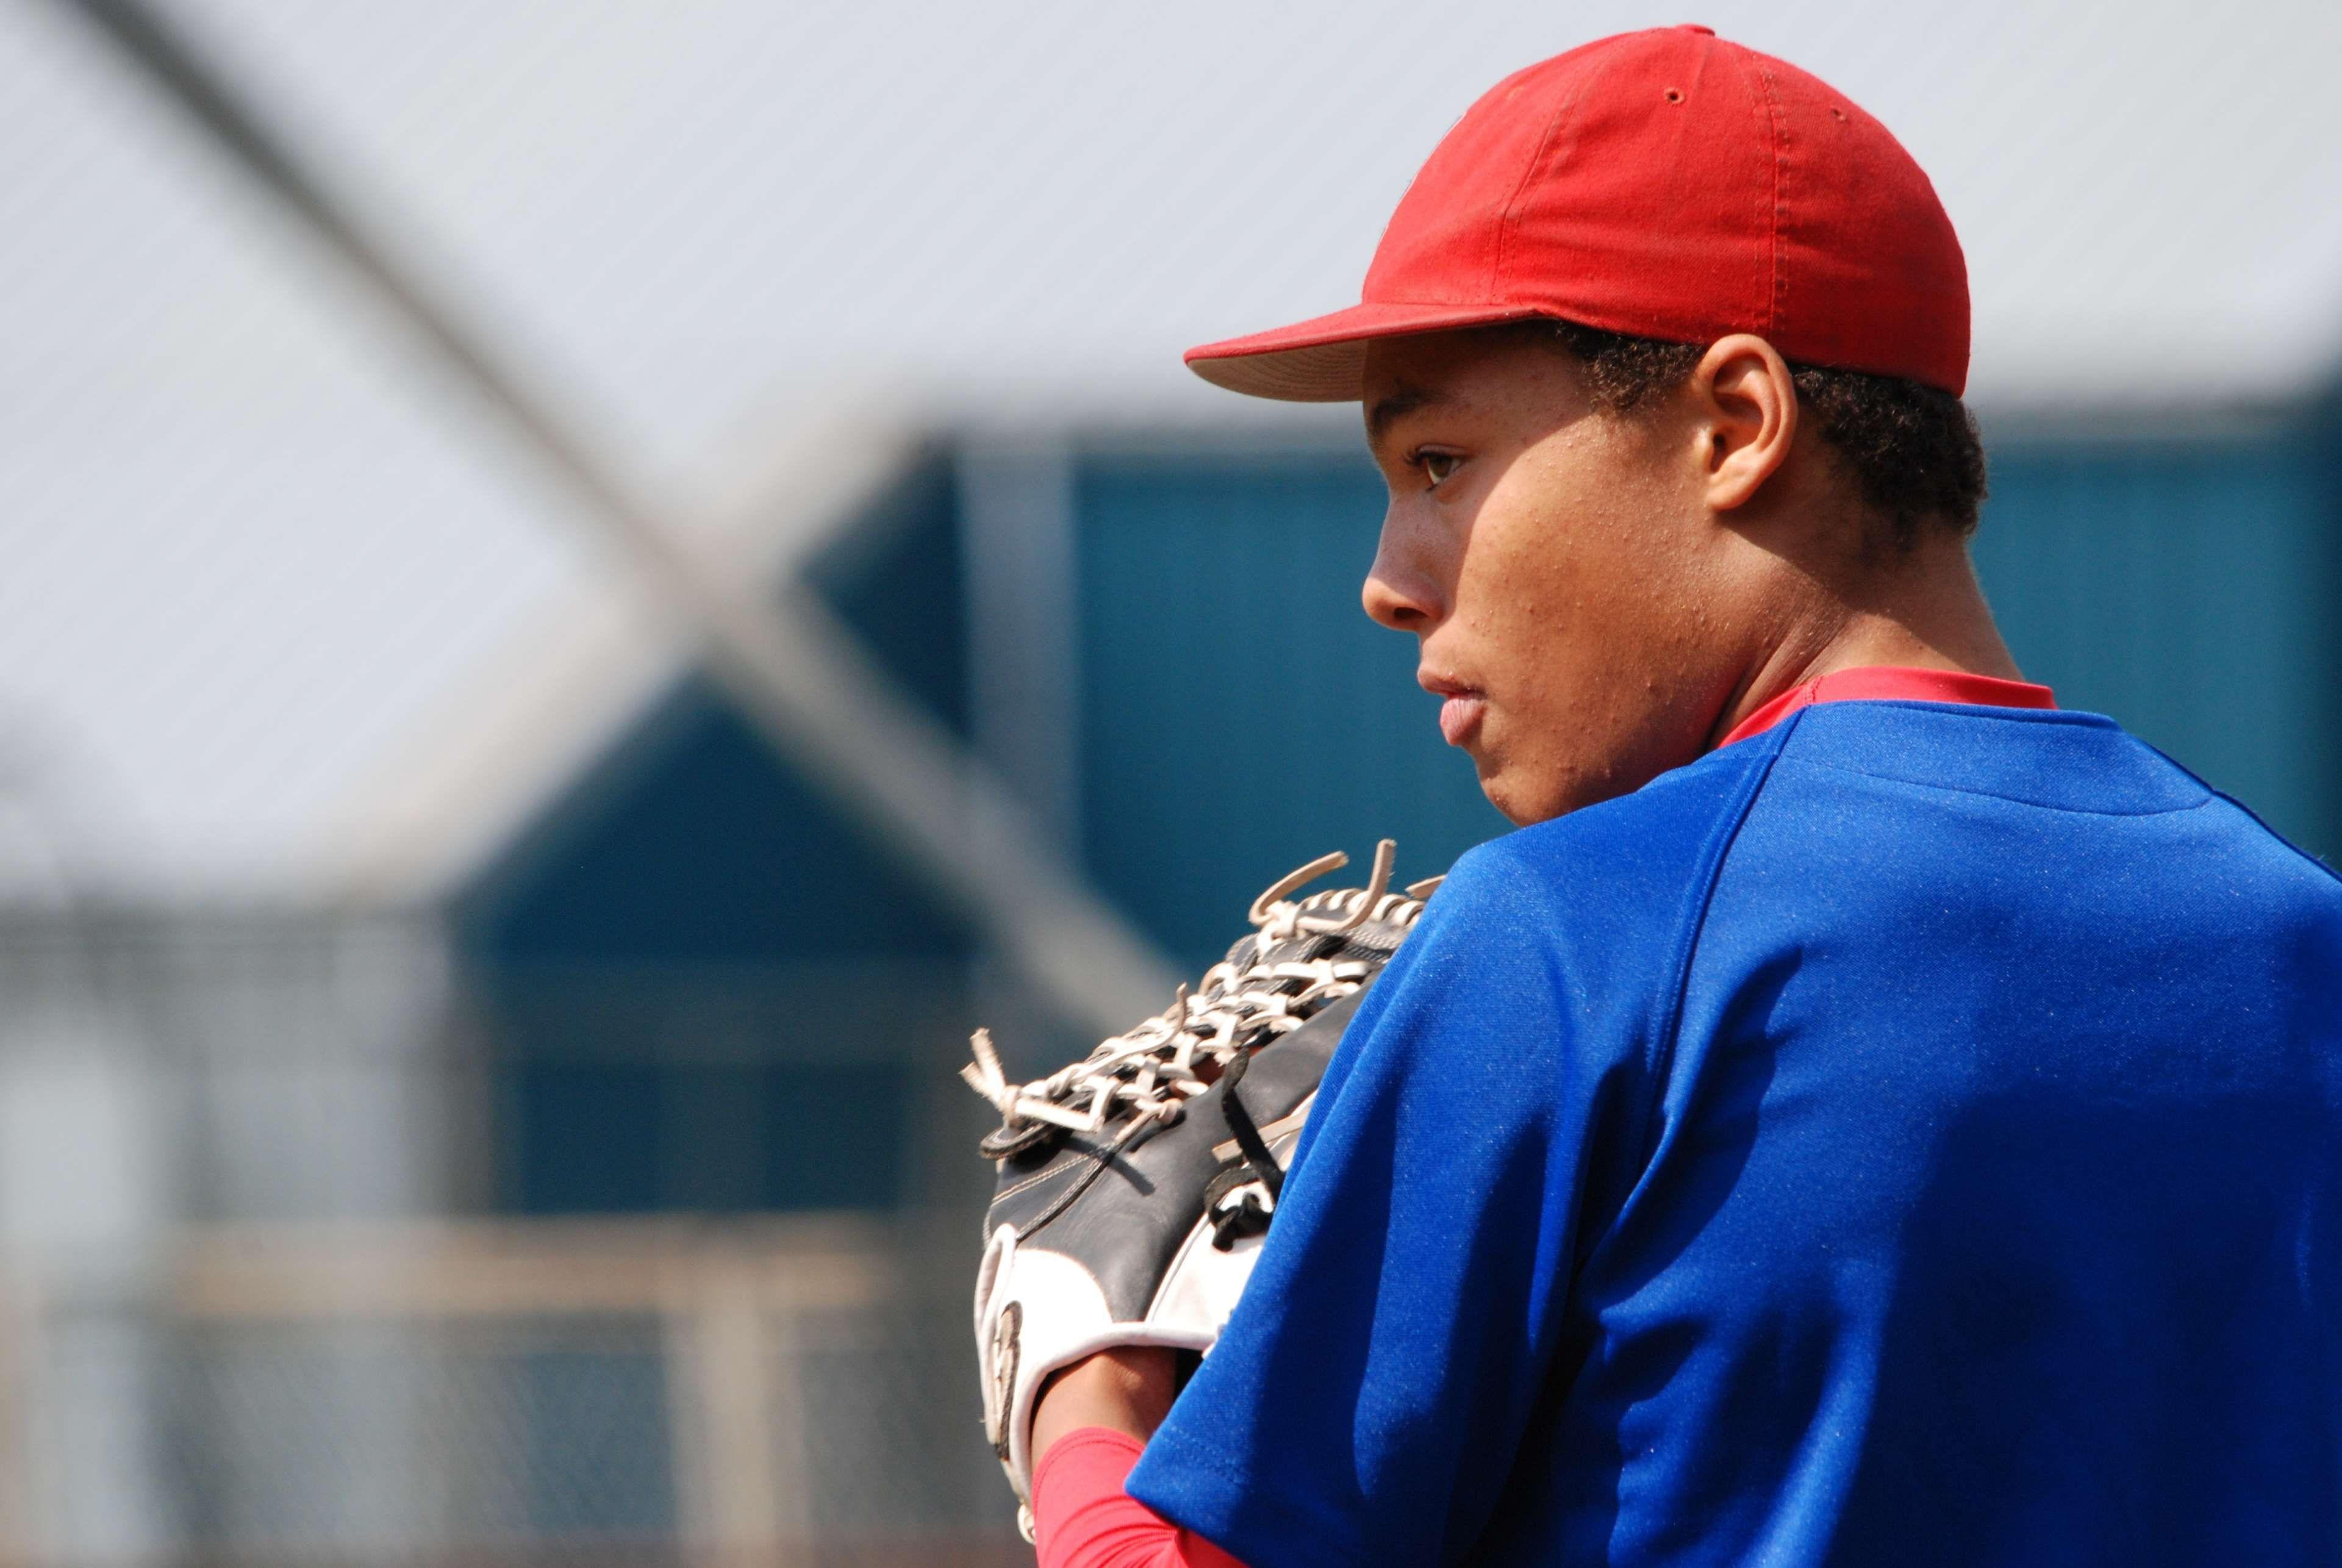 #athlete #baseball #baseball mitt #baseball player #blur #blurry #boy #close up #game #glove #guy #jersey #leisure #male #man #outdoors #pitcher #player #professional #recreation #sport #sports #staring #uniform